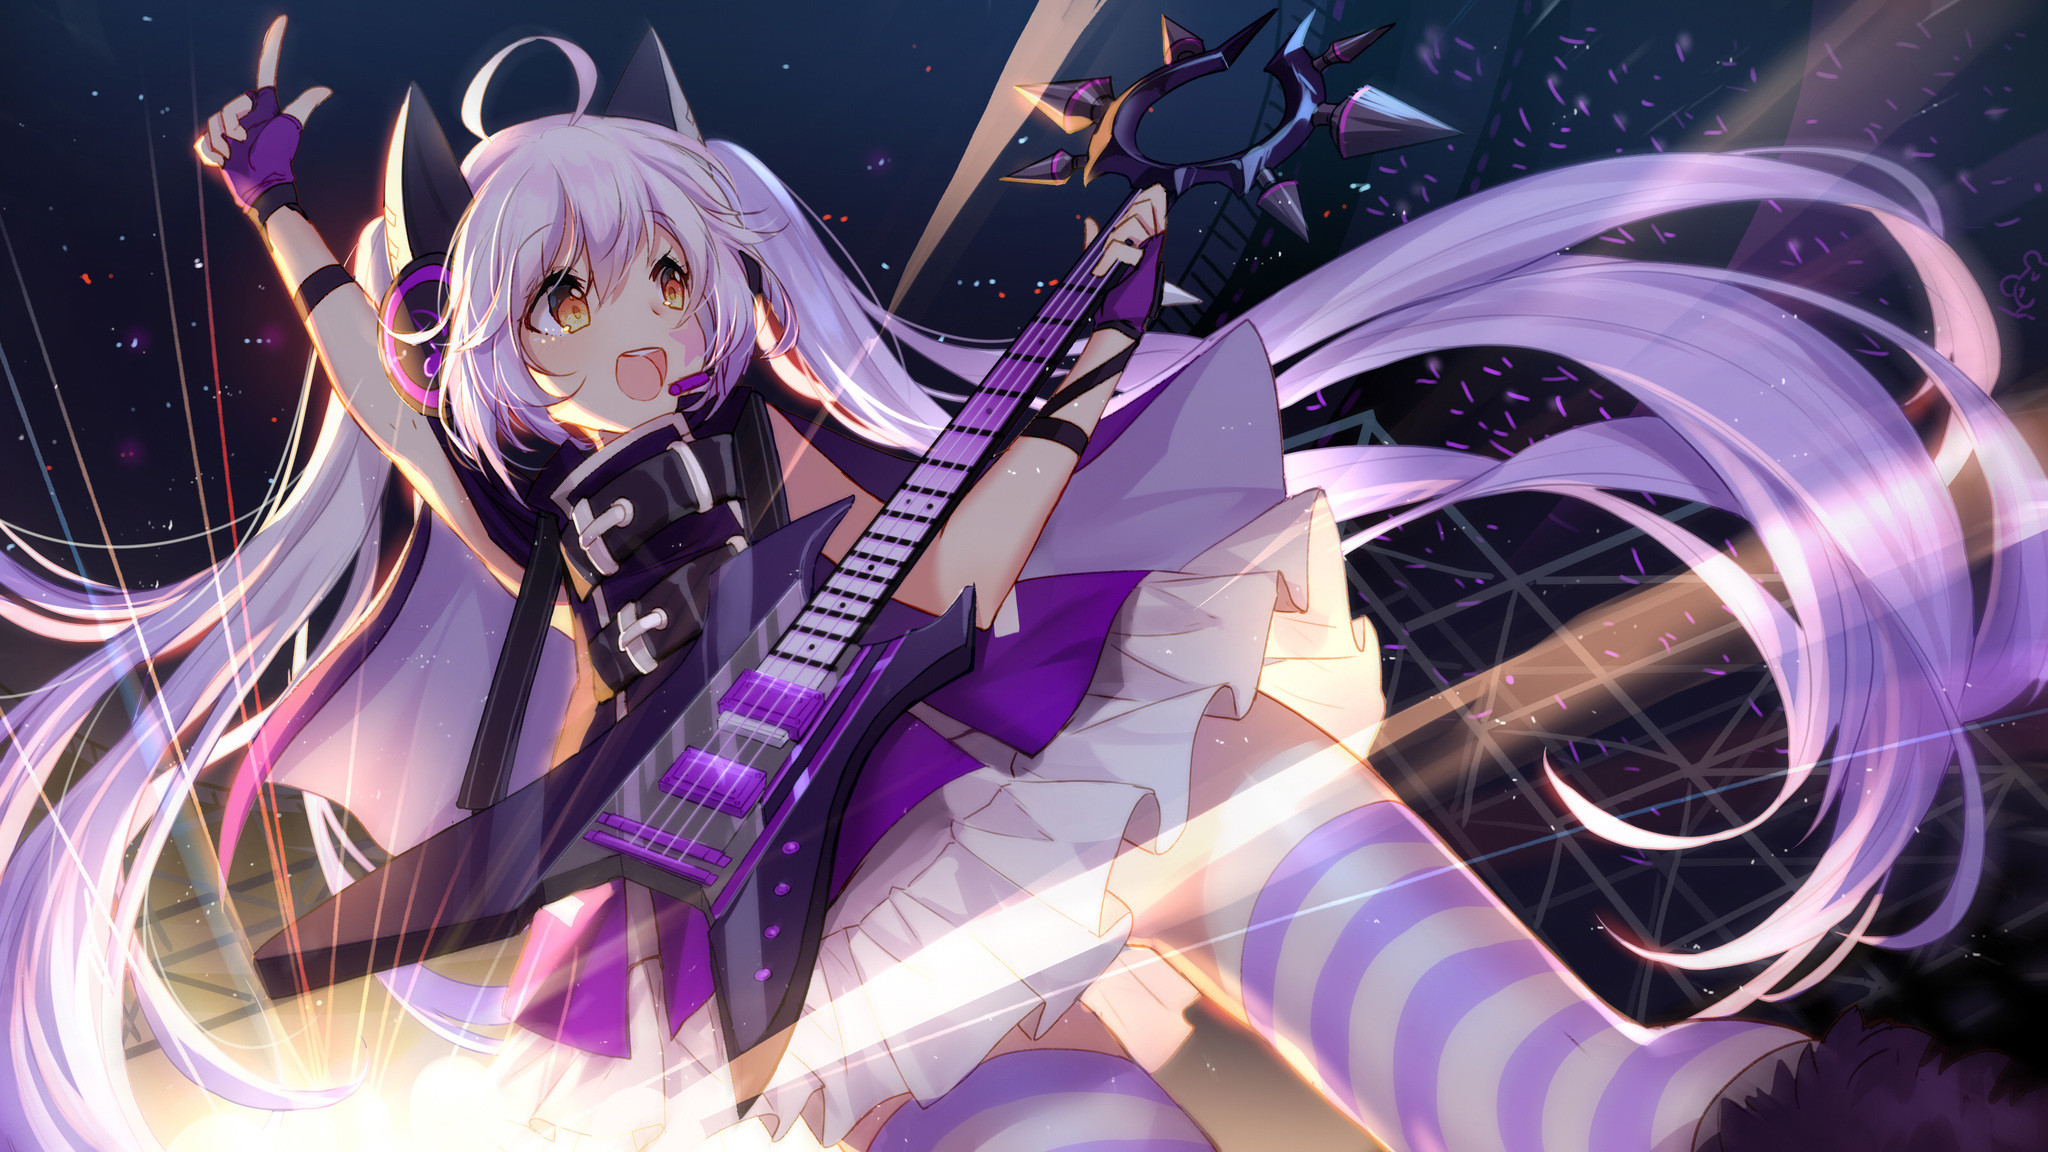 Res: 2048x1152, anime-girl-concert-4k-bi.jpg